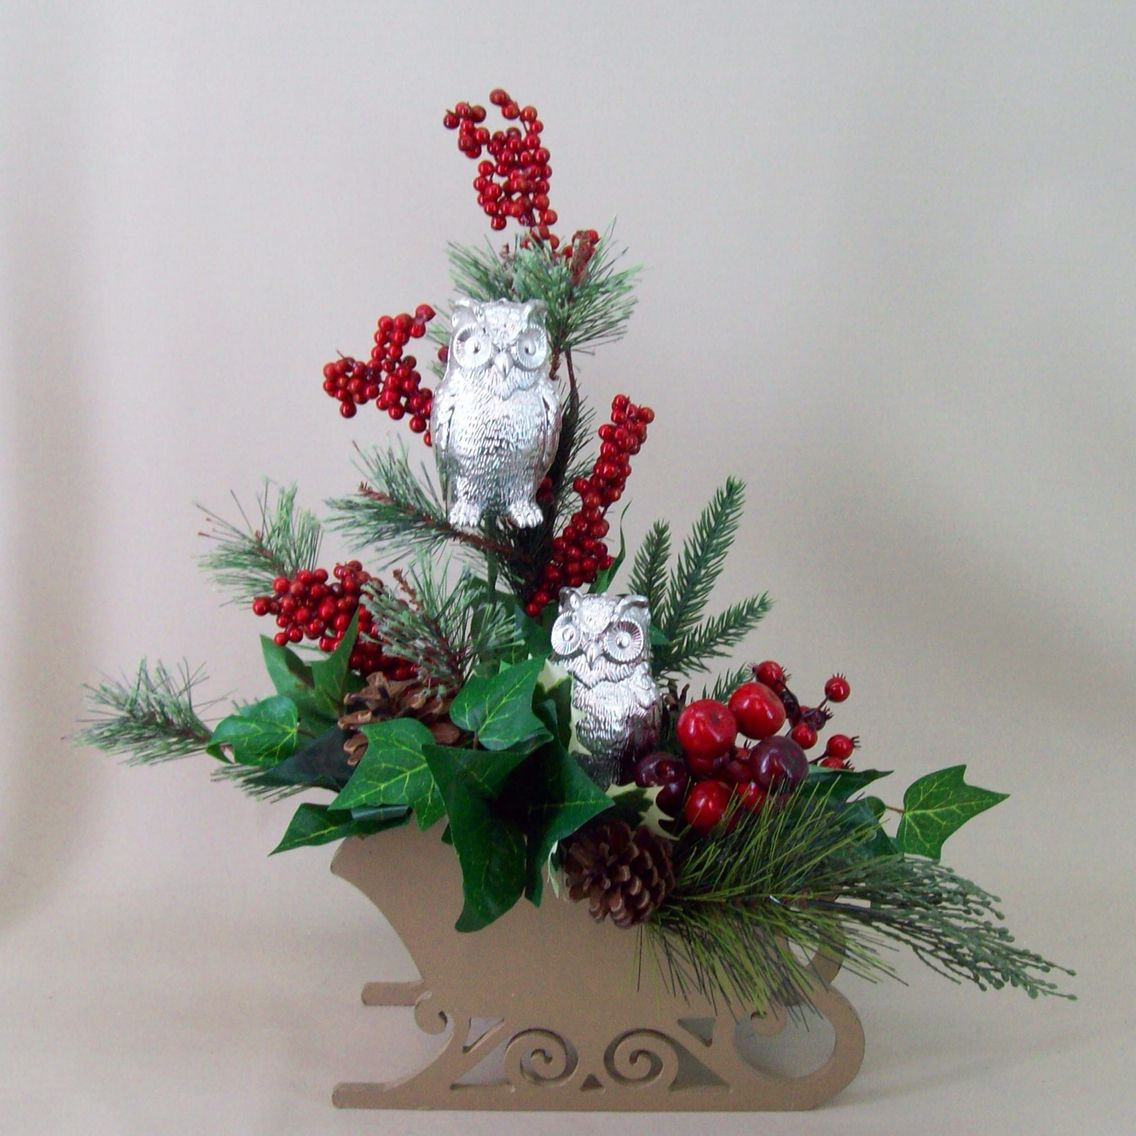 Diy Christmas Decorations From Decoflora Httpsfacebook